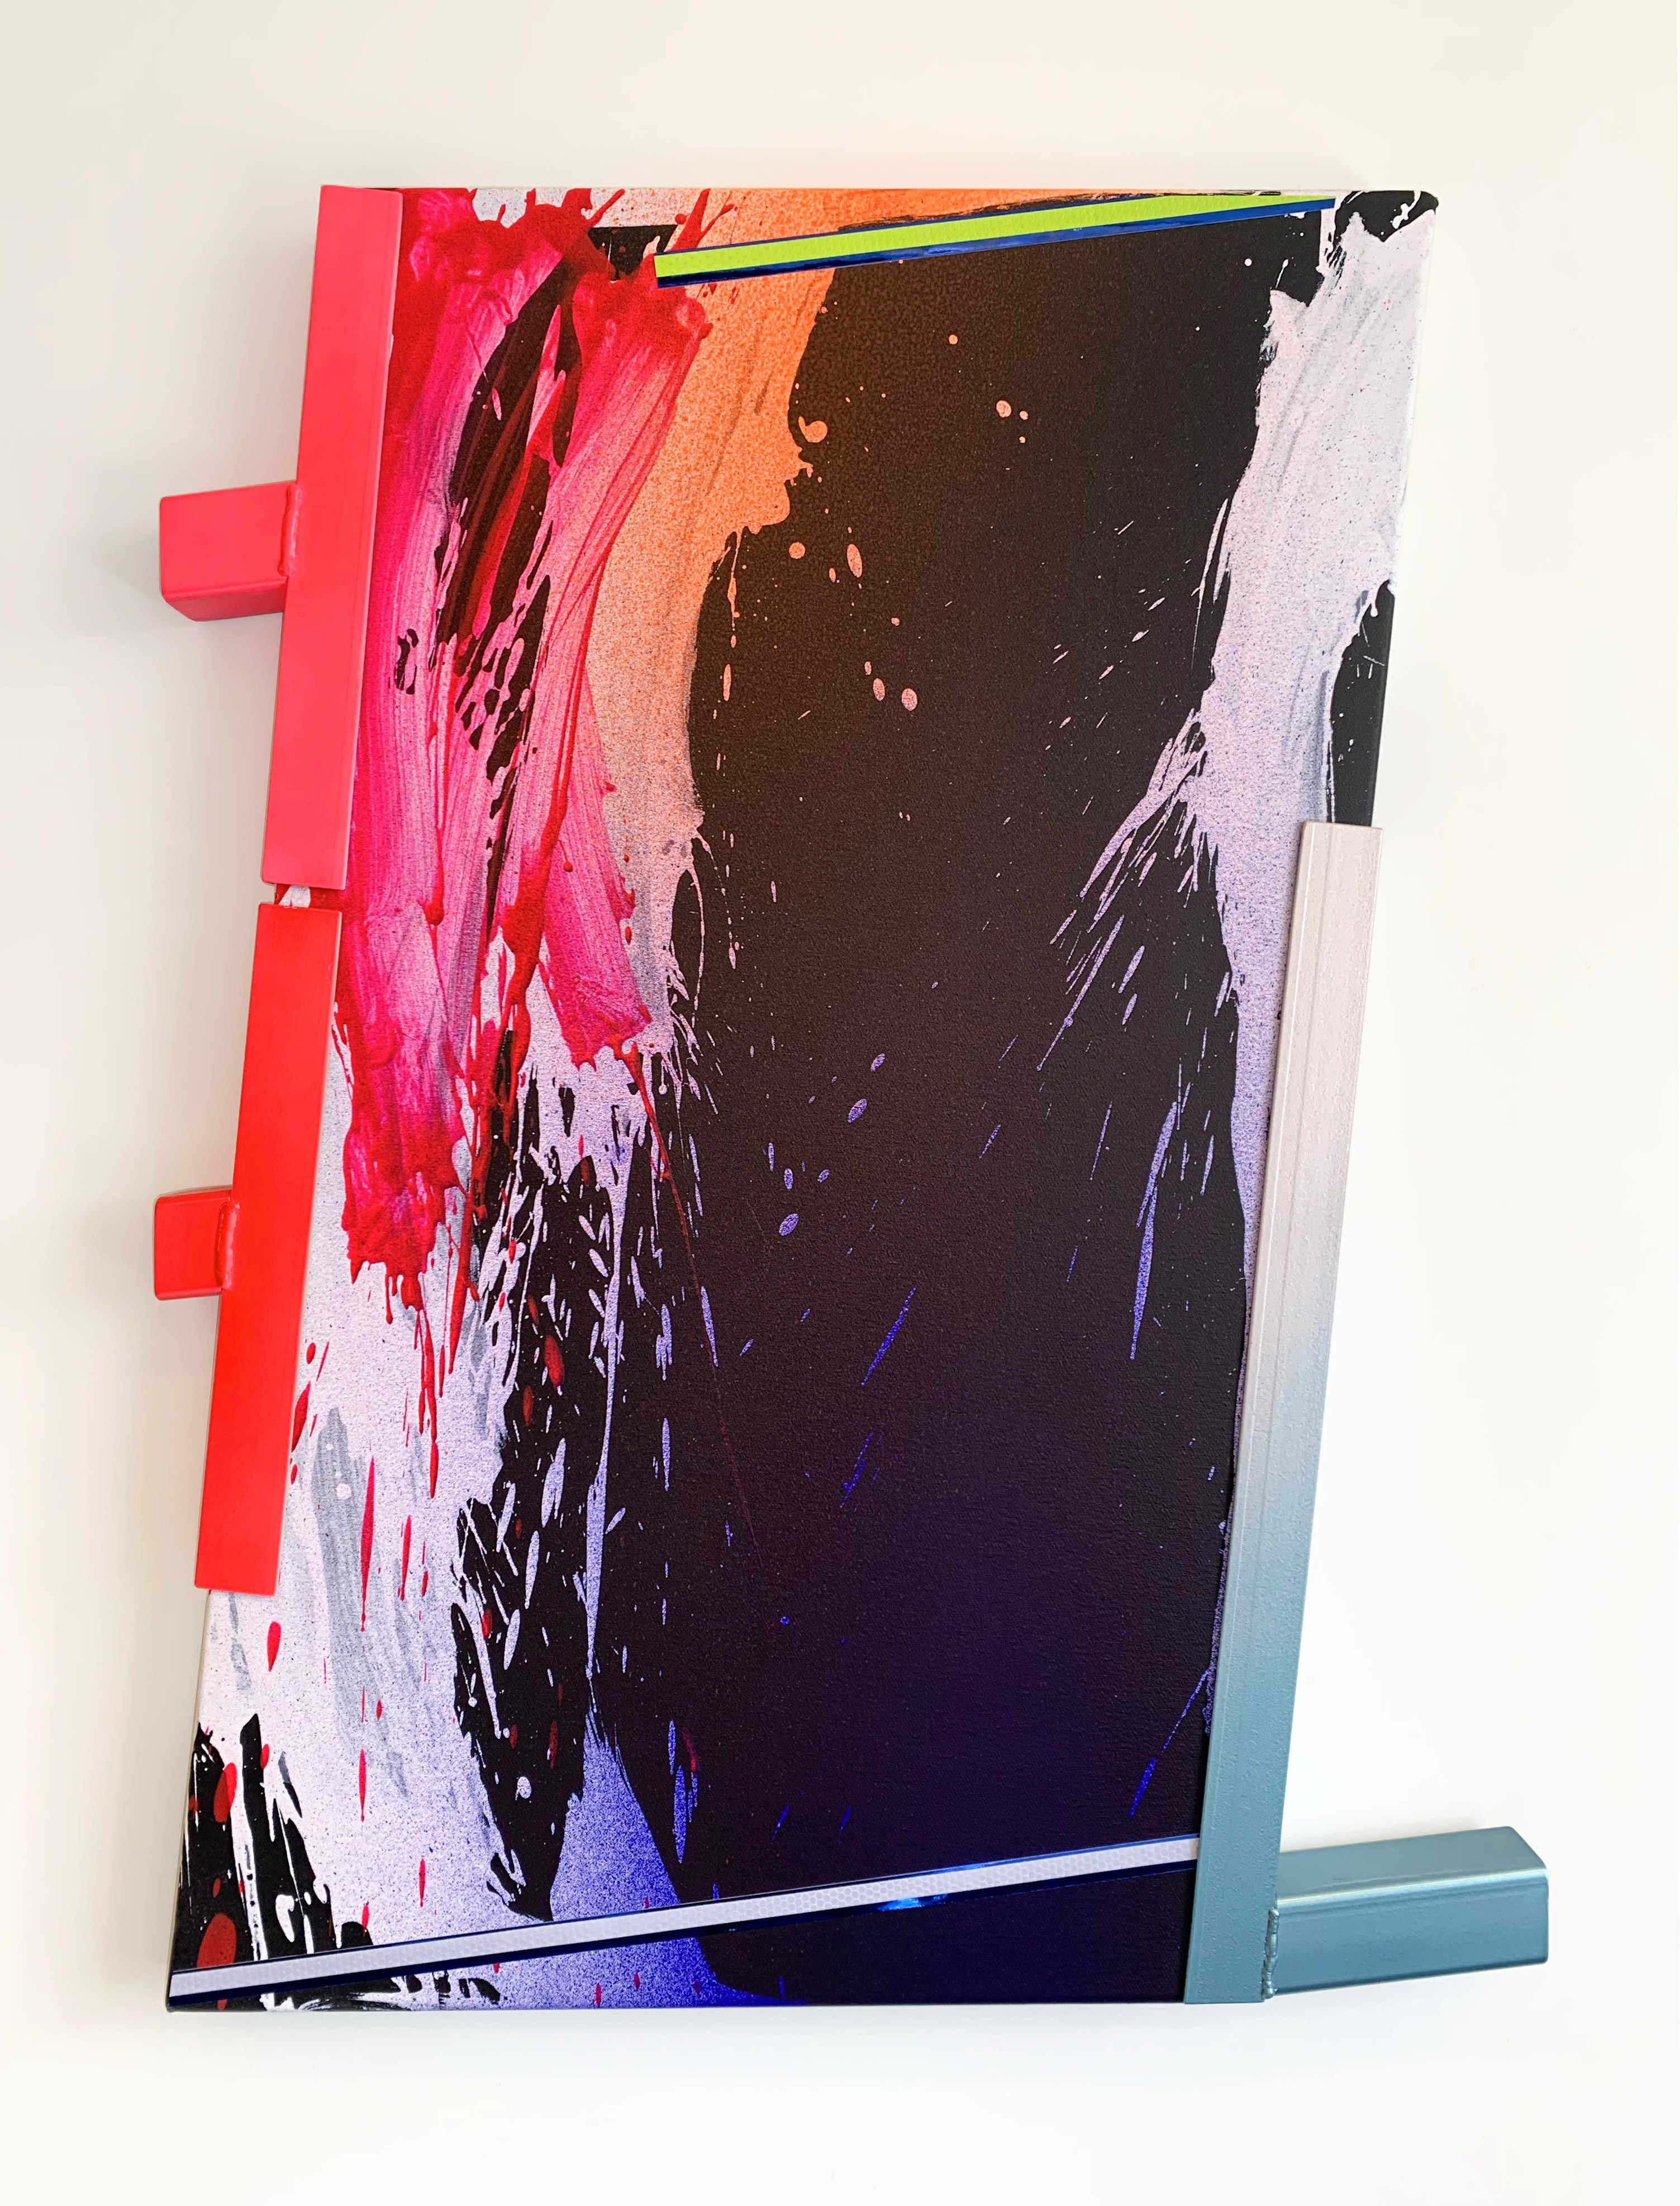 NemesM_The-Better-Self-04_2020_88x62_carpaint-steel-acrylic-canvas-wood-min